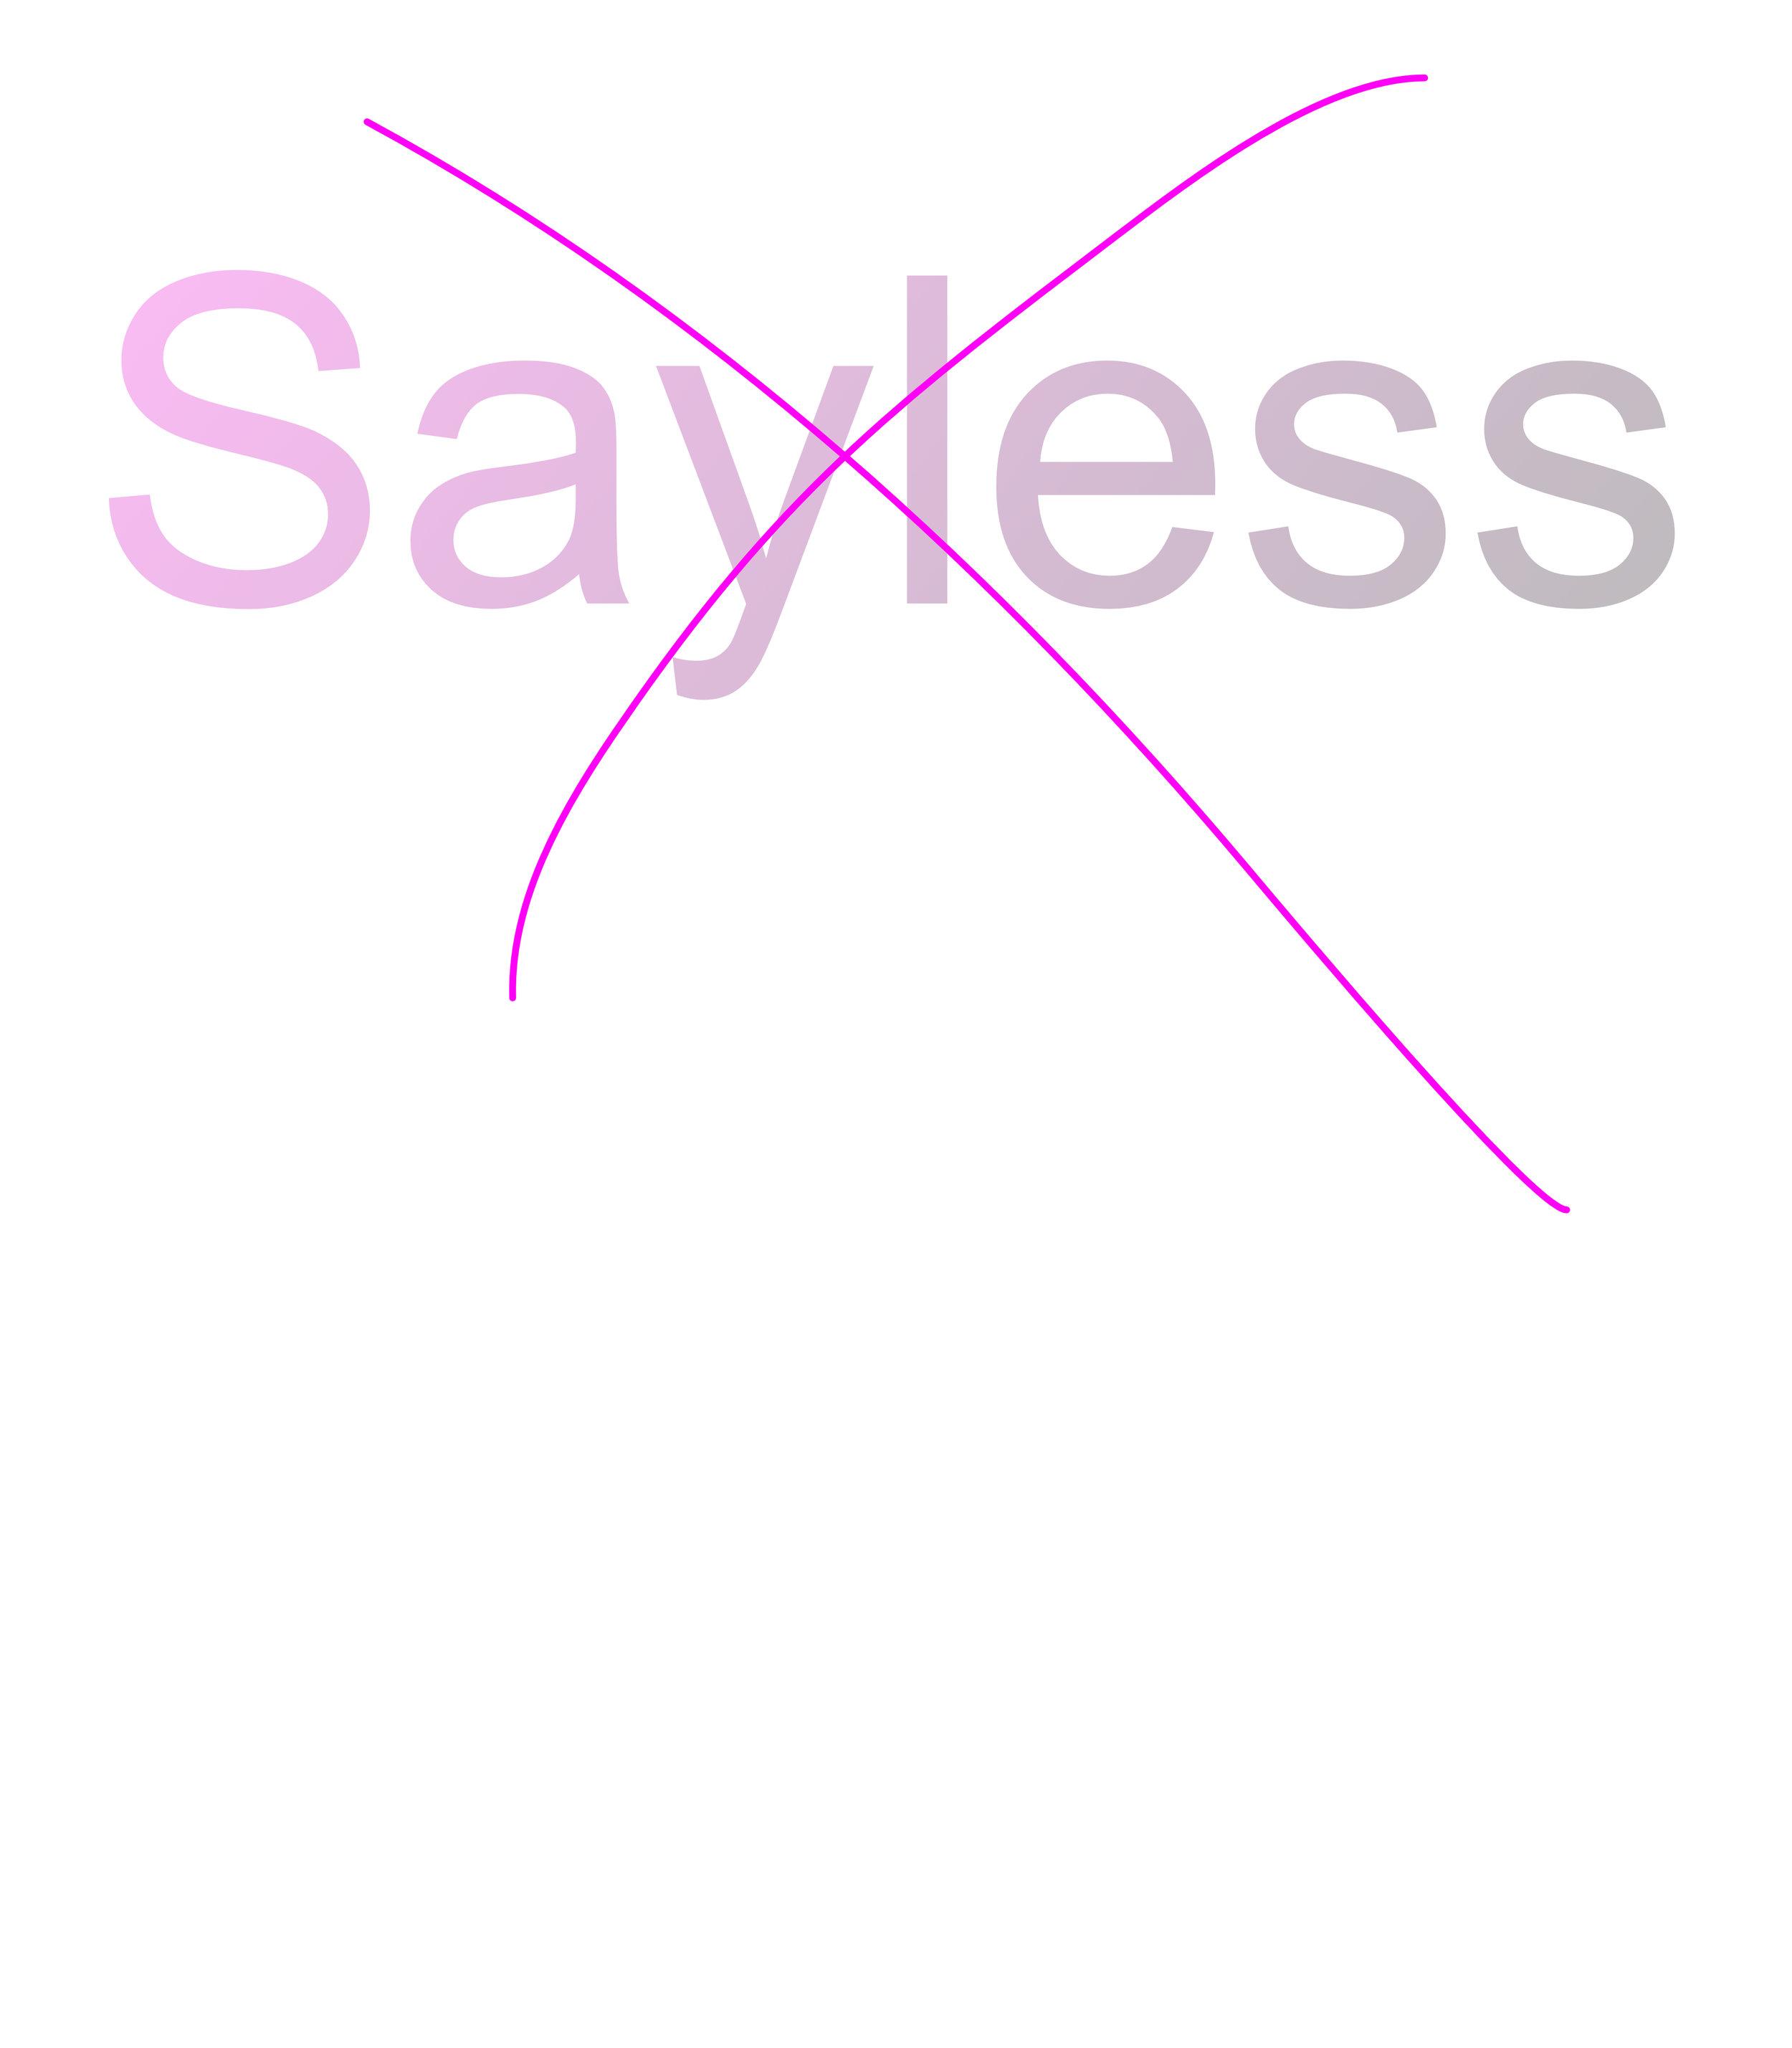 Sayless copy.jpg